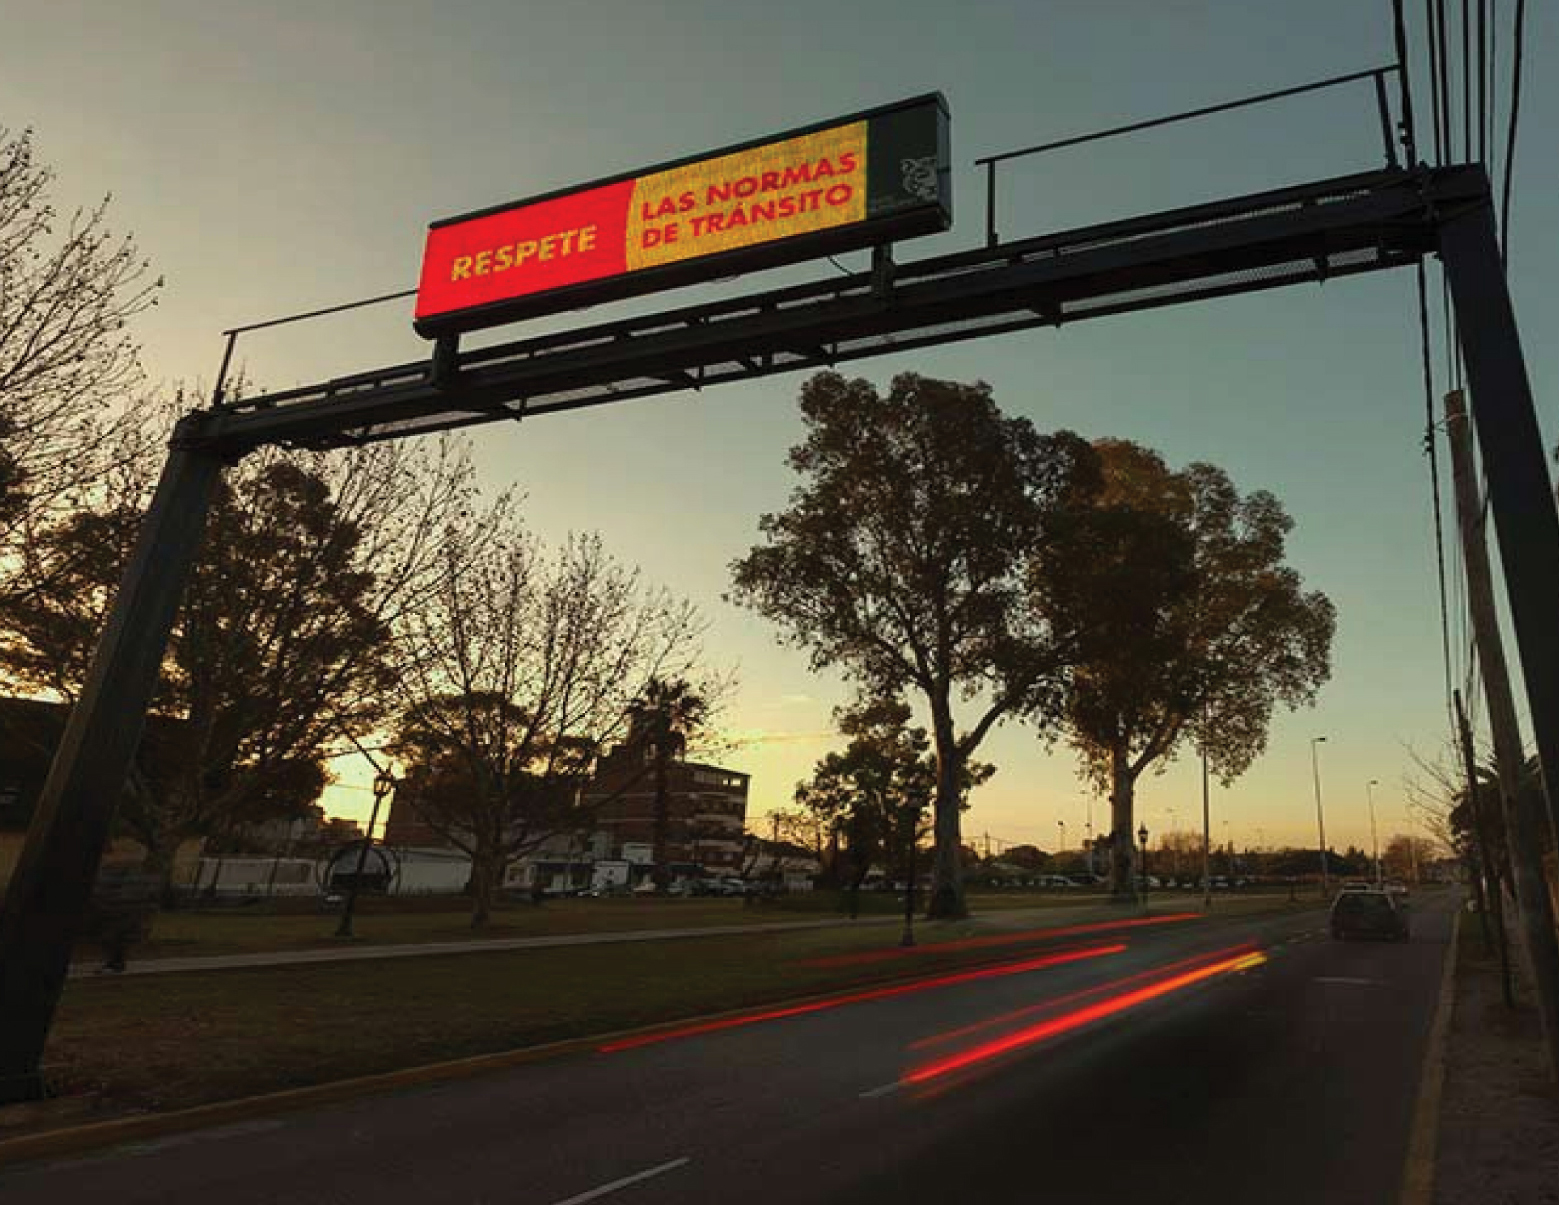 Boulevard Led